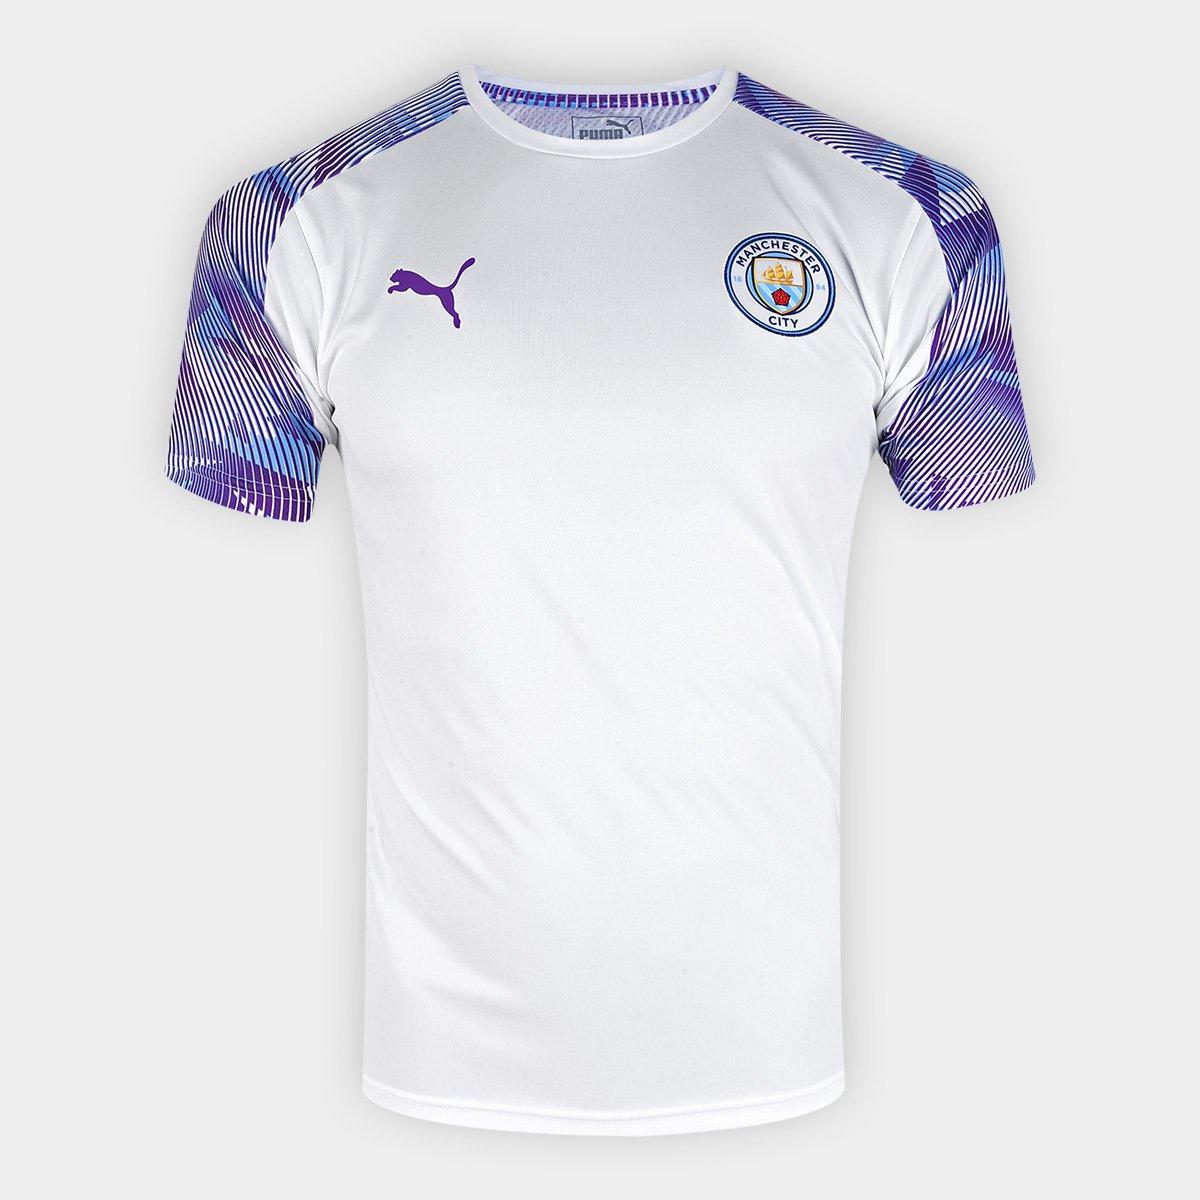 capitalismo Corte Quemar  Camisa Manchester City 19/20 Treino Puma Masculina | Netshoes